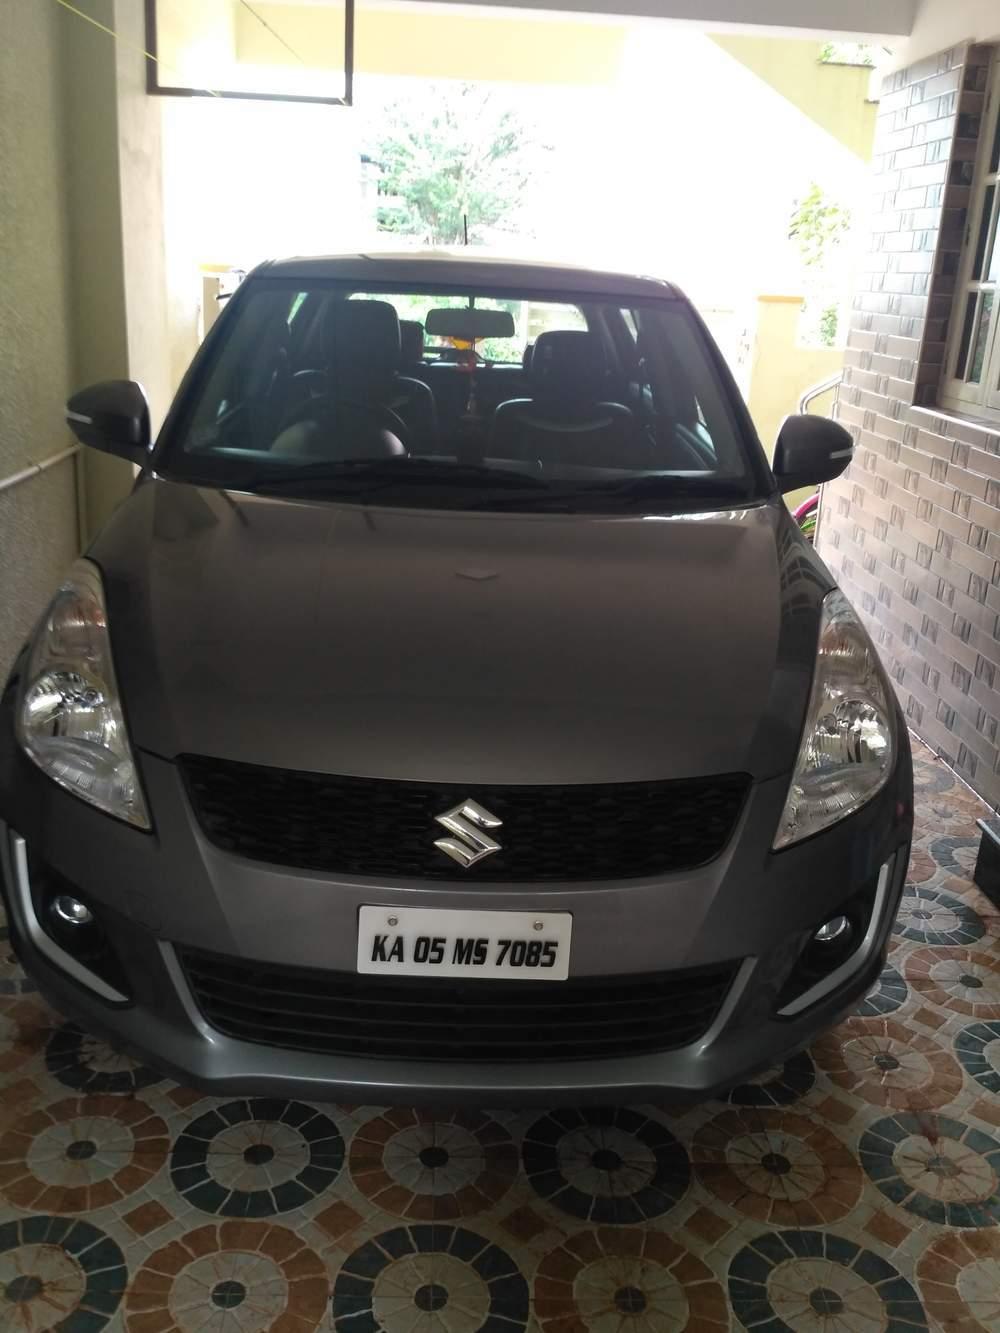 New Maruti Suzuki Swift Rear Right Side Angle View